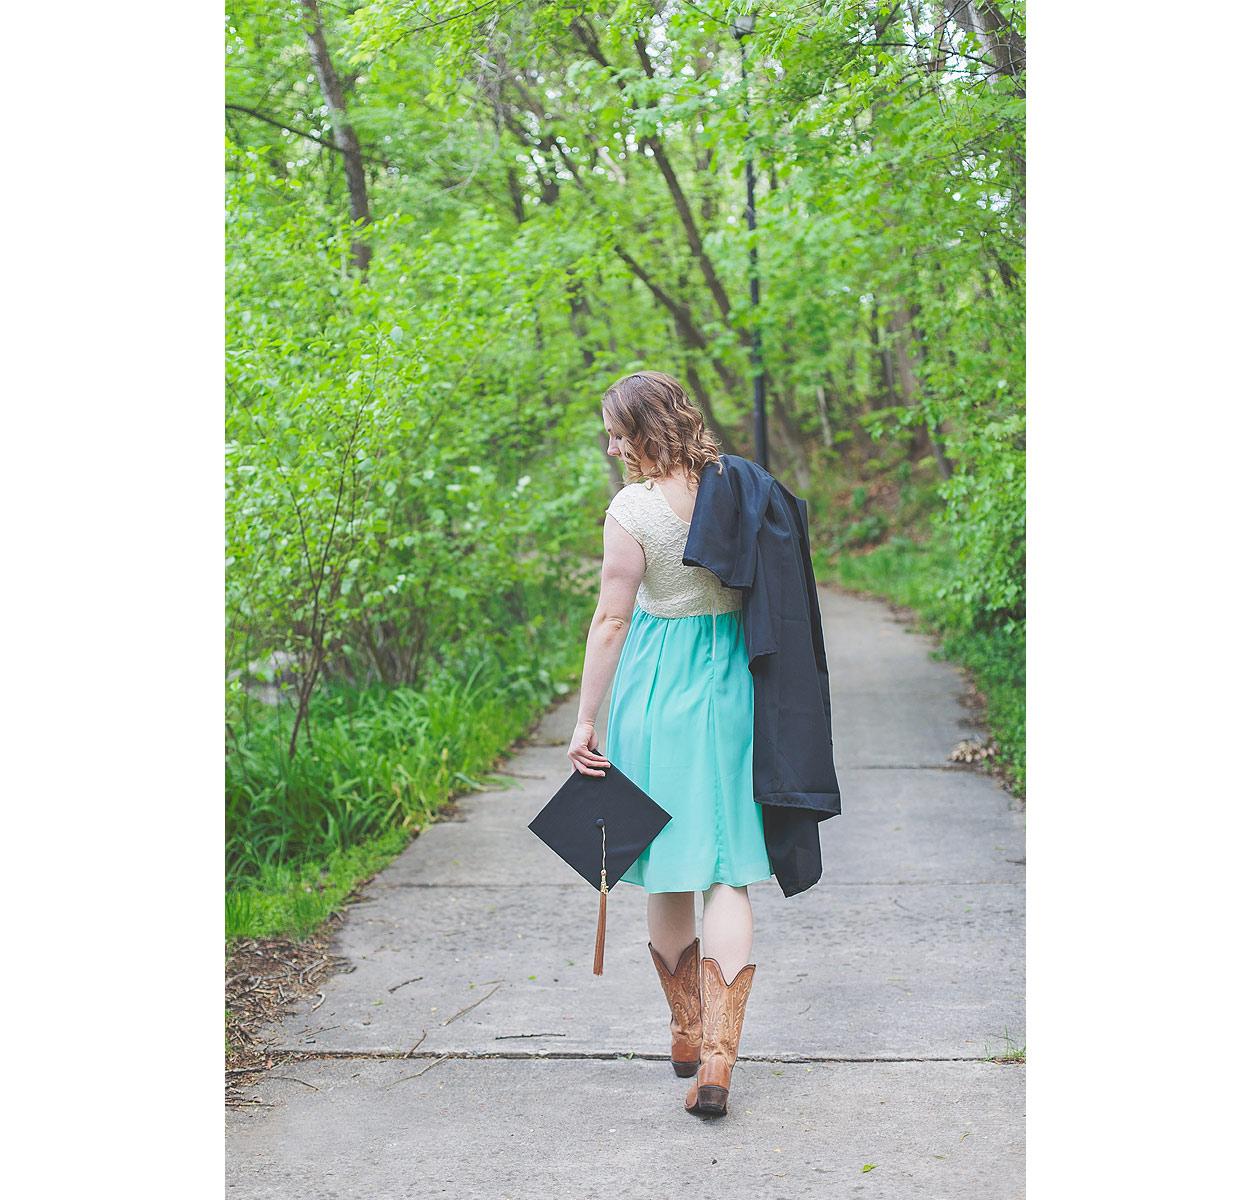 CollegeGraduationPortraits-HeidiRandallStudios-Kat-15.jpg